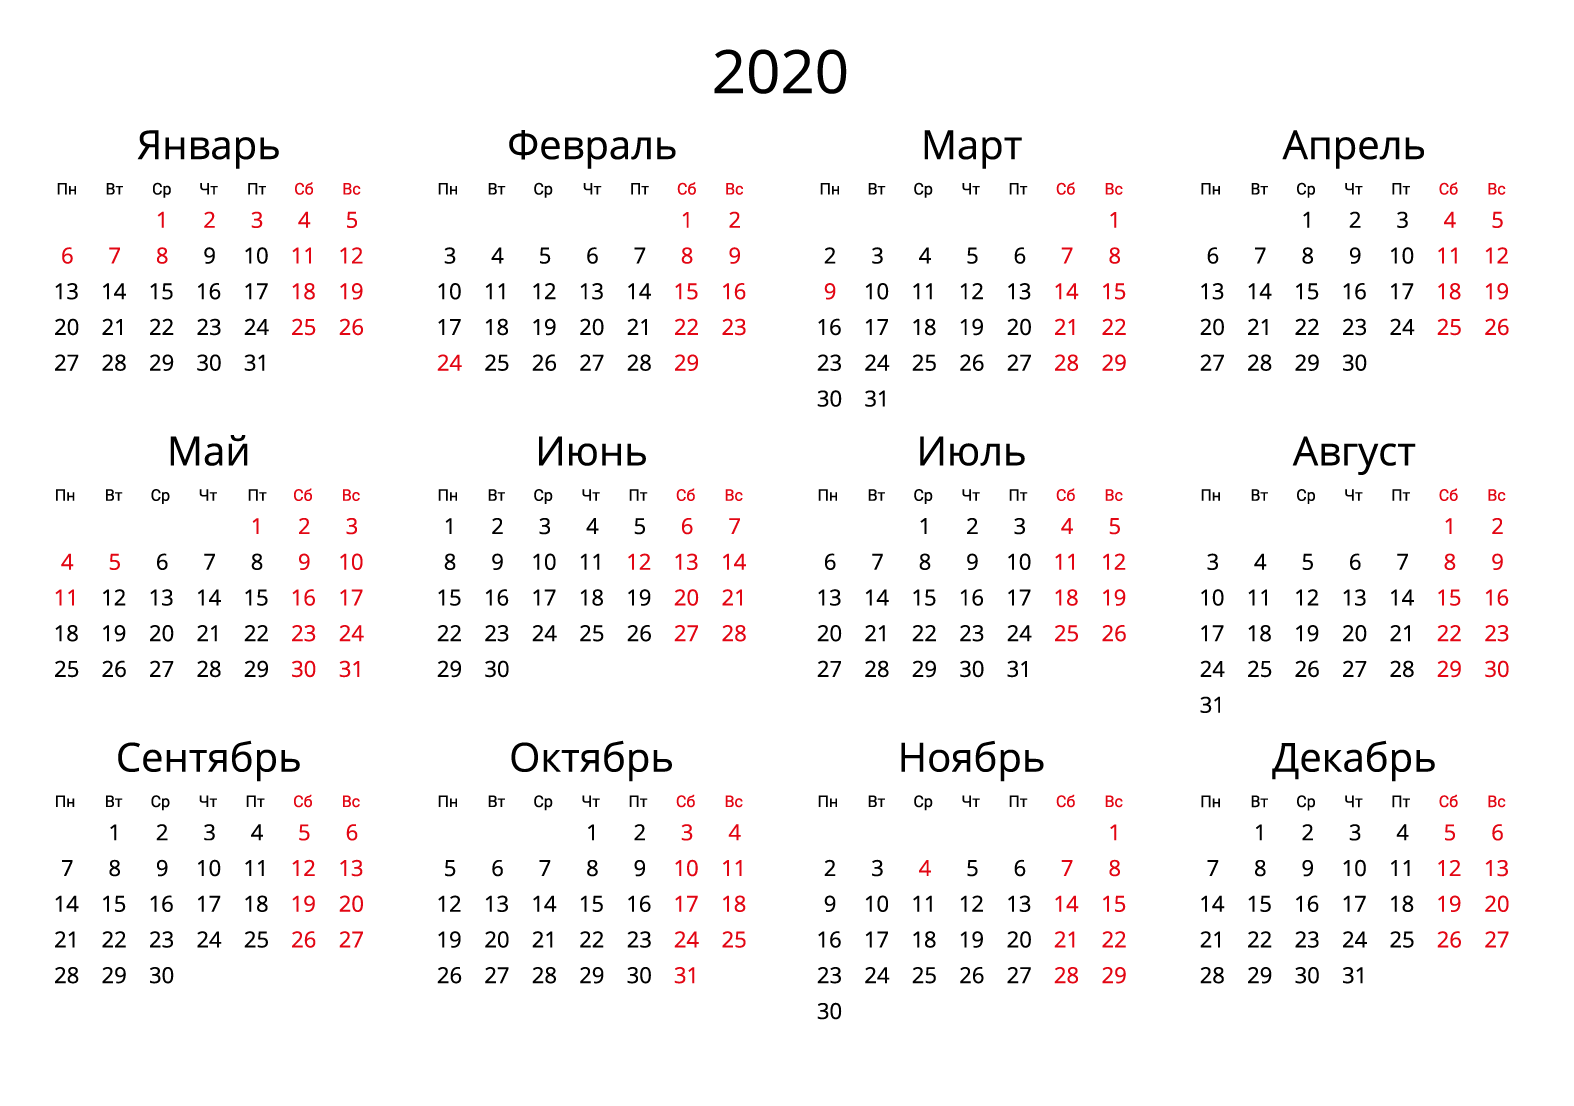 Календарь 2020 альбомный формат